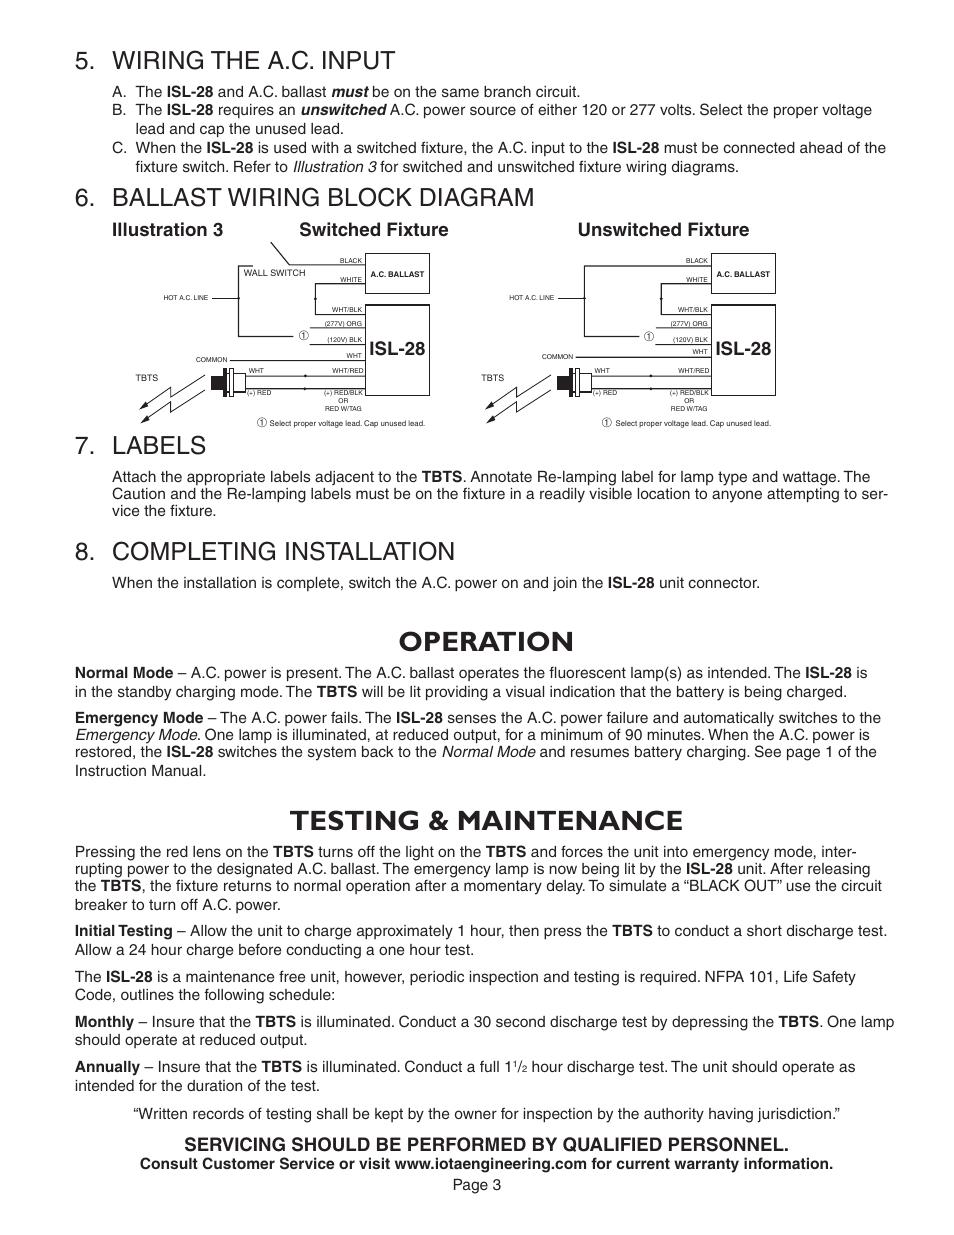 iota isl 28 page3?resize\\\=665%2C861 iota emergency ballast wiring diagram 1 lamp gandul 45 77 79 119  at nearapp.co